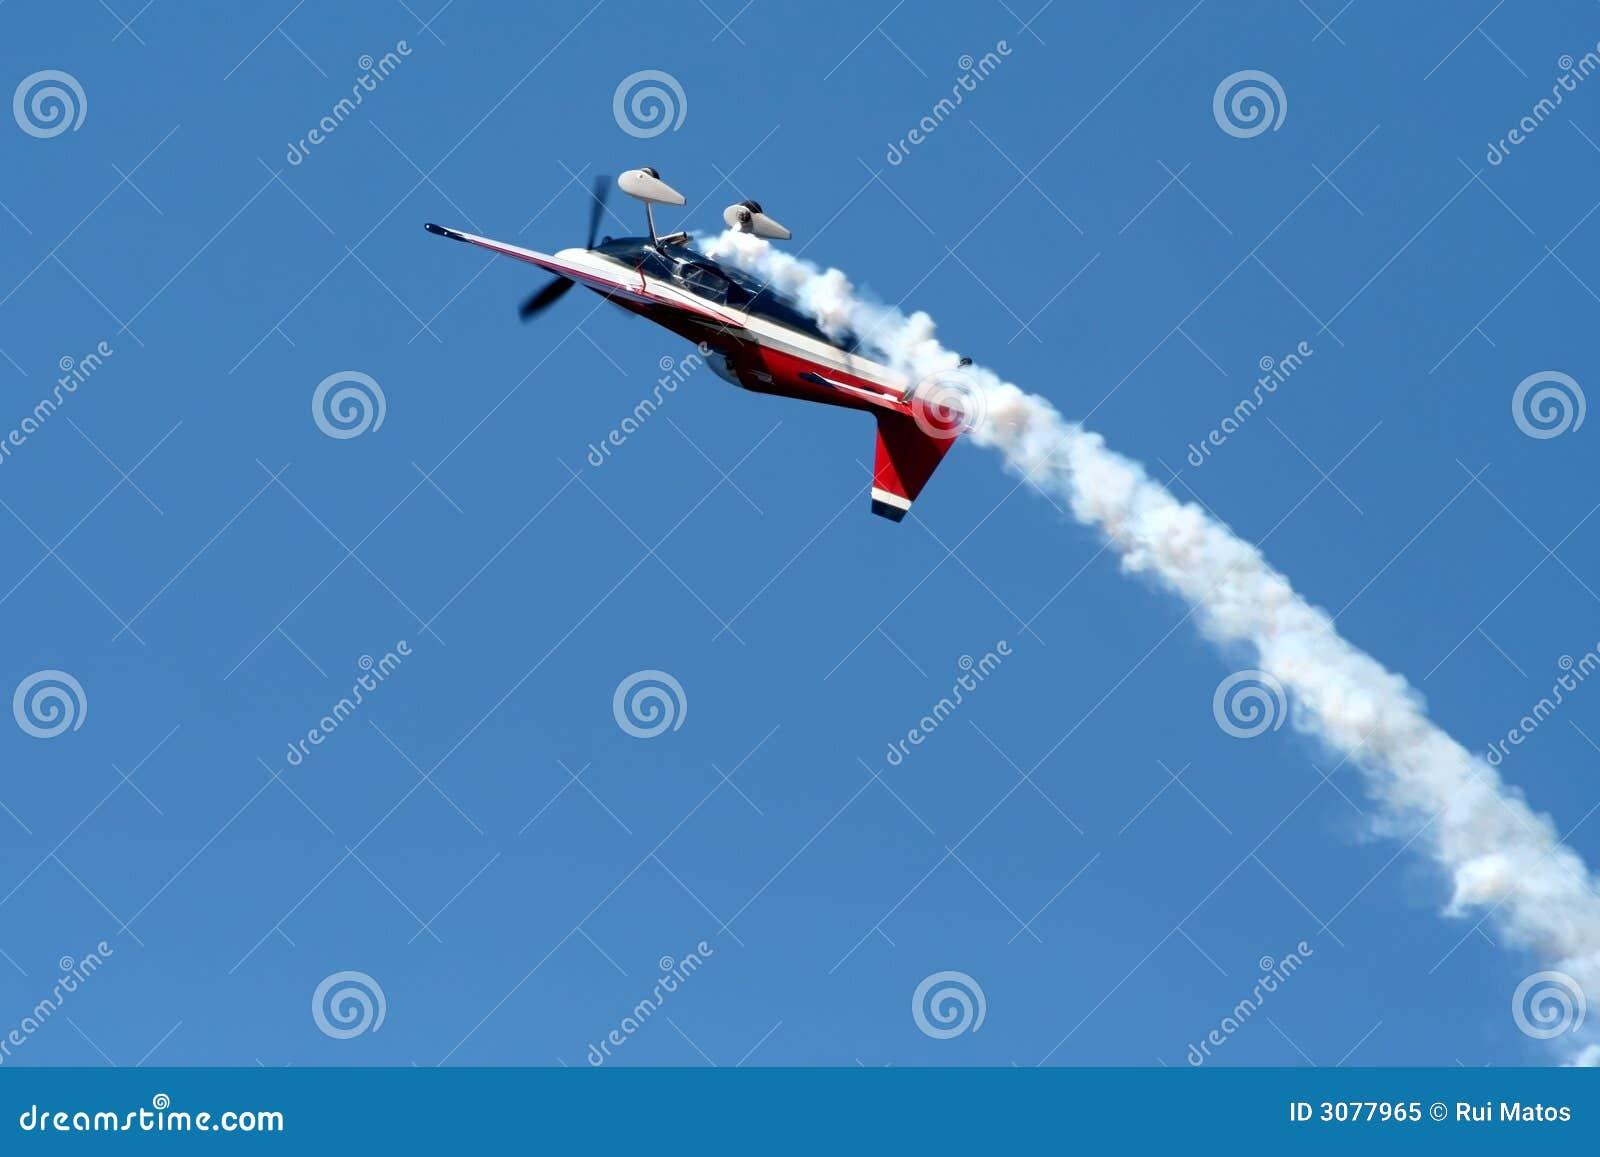 Airplane in airshow maneuvers